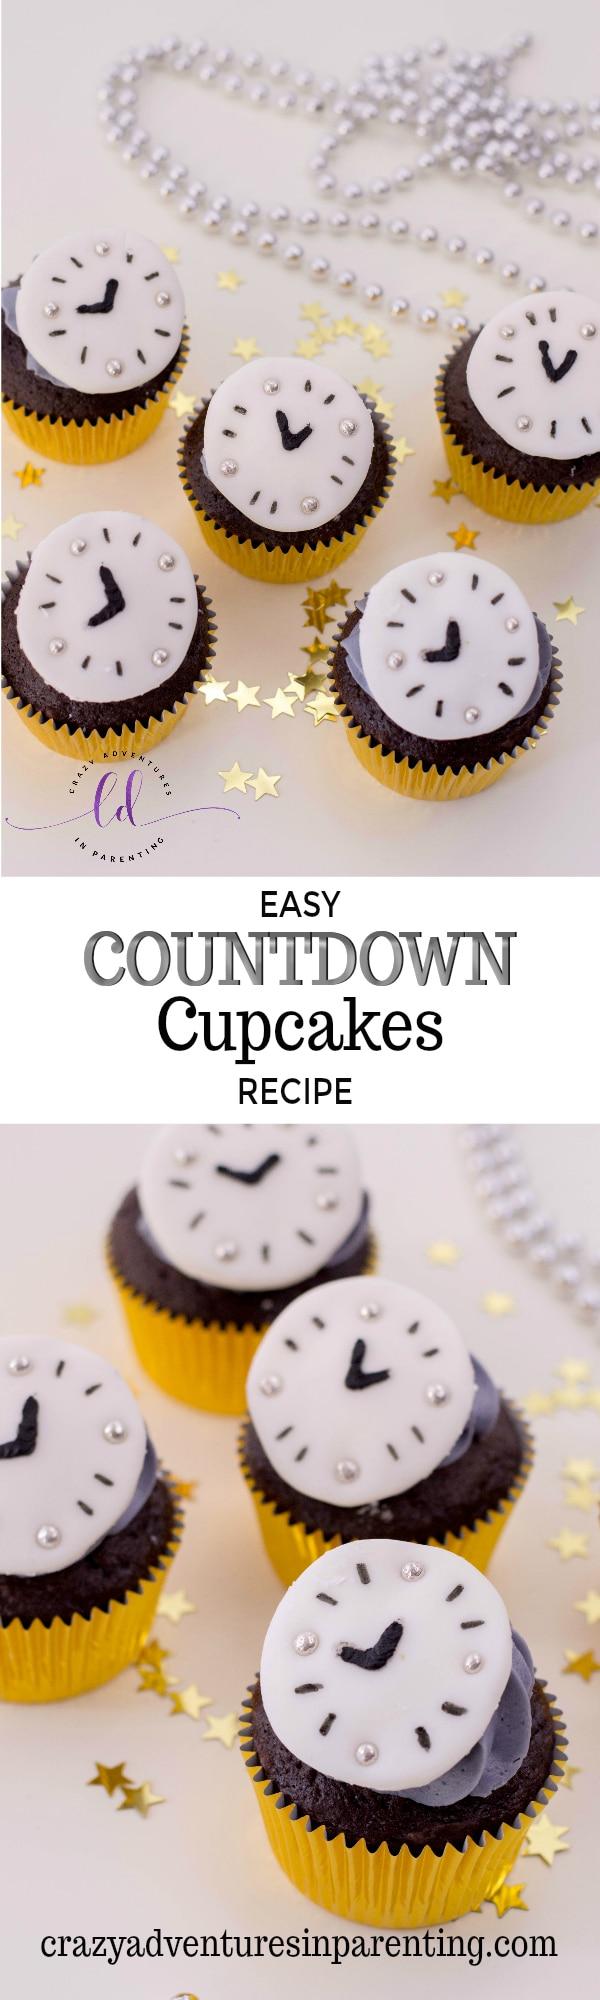 Easy Countdown Cupcakes Recipe